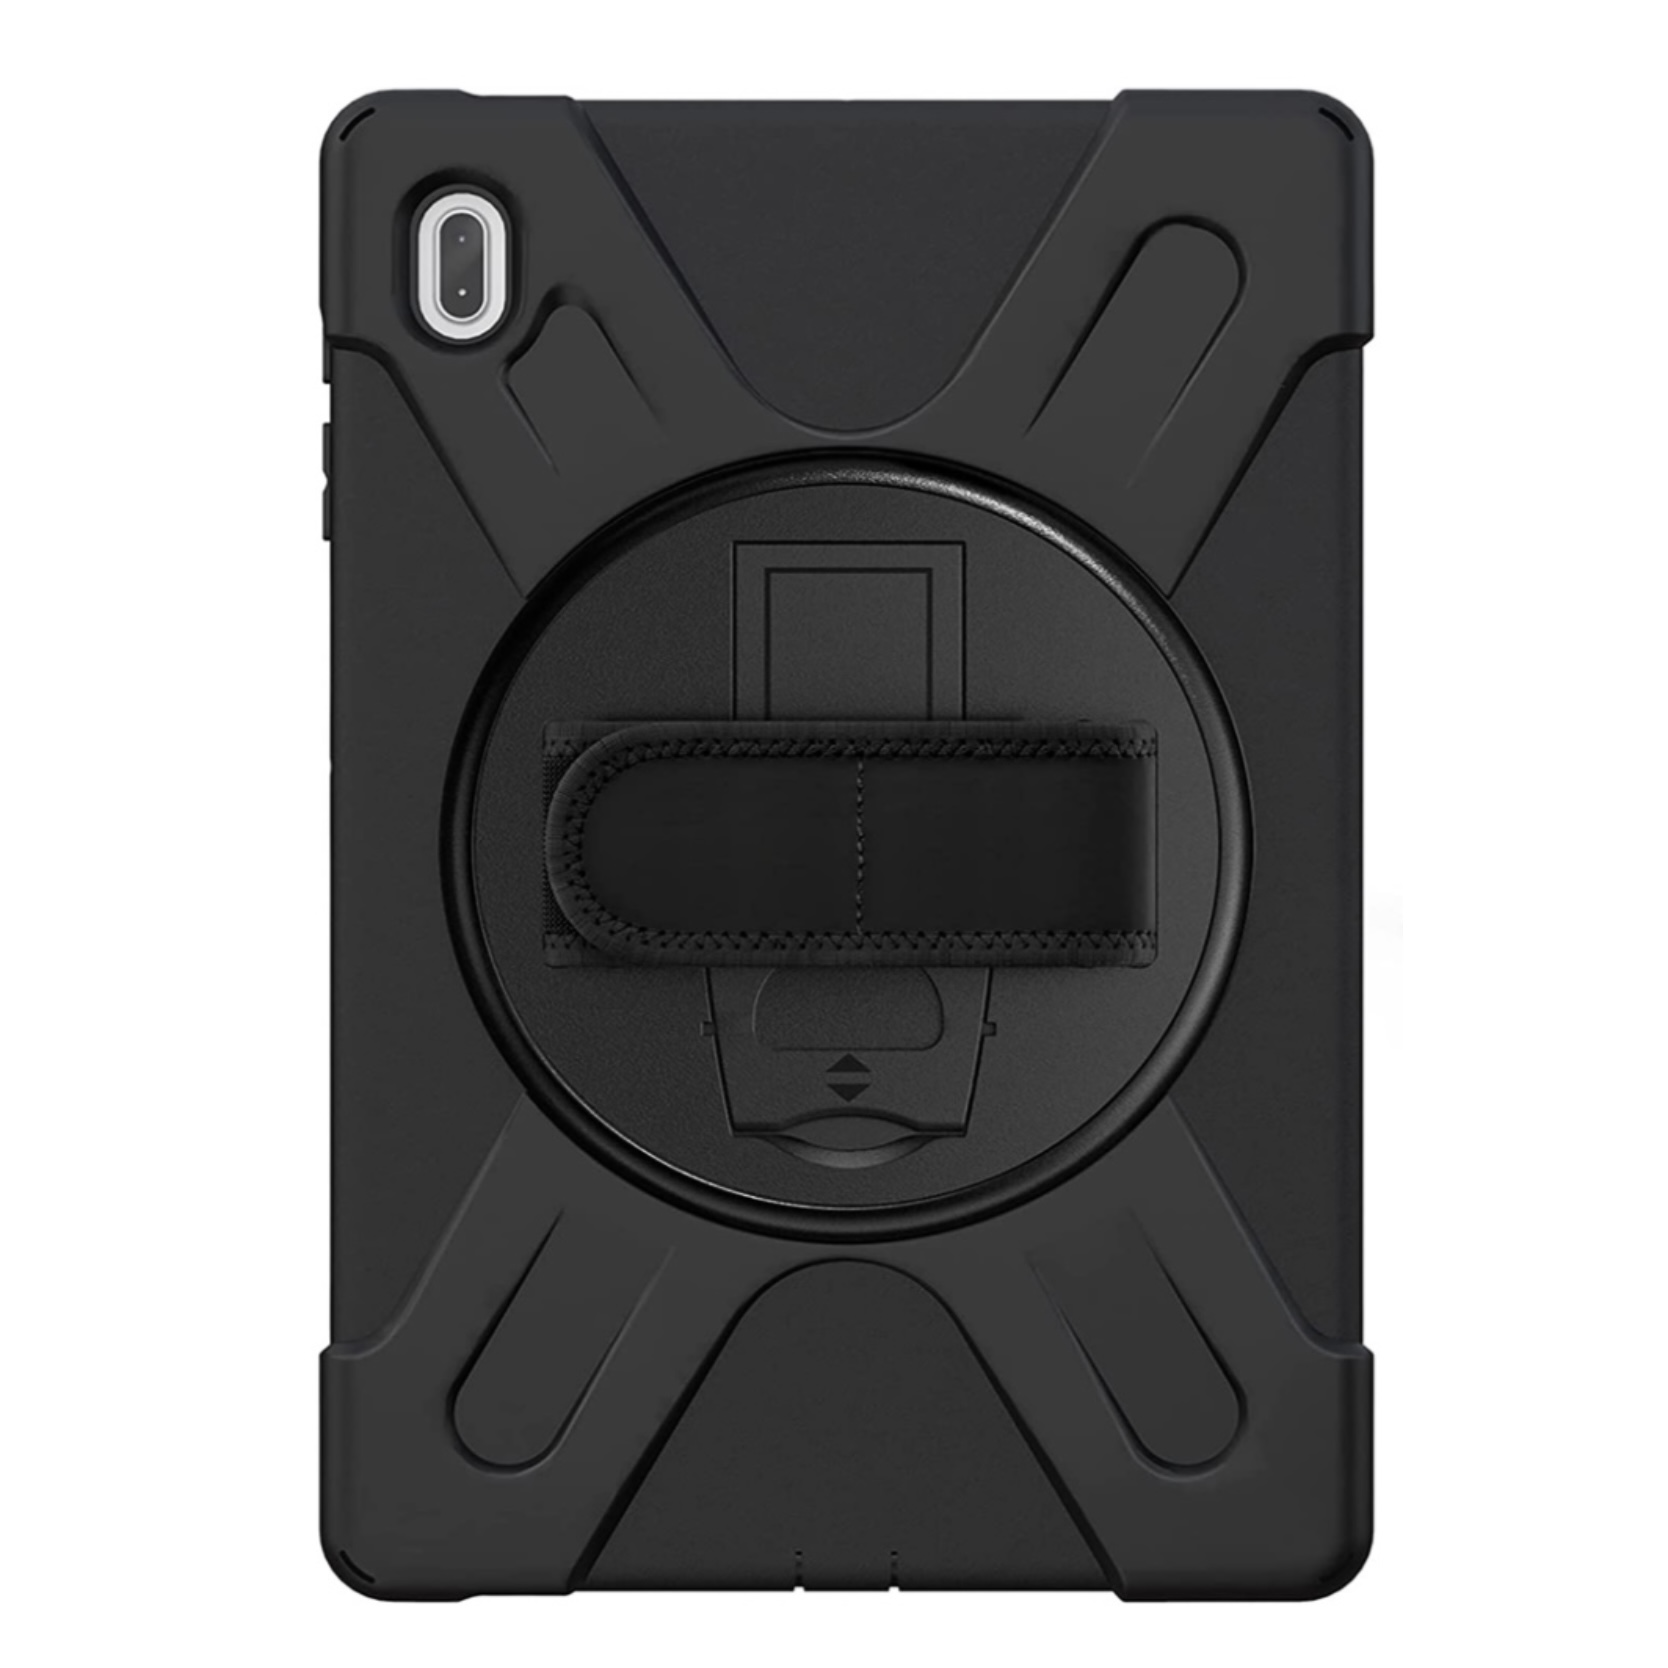 REF 2589 Coque de protection Sangle main Galaxy TAB S7 FE 12.4 pouces Vancouver